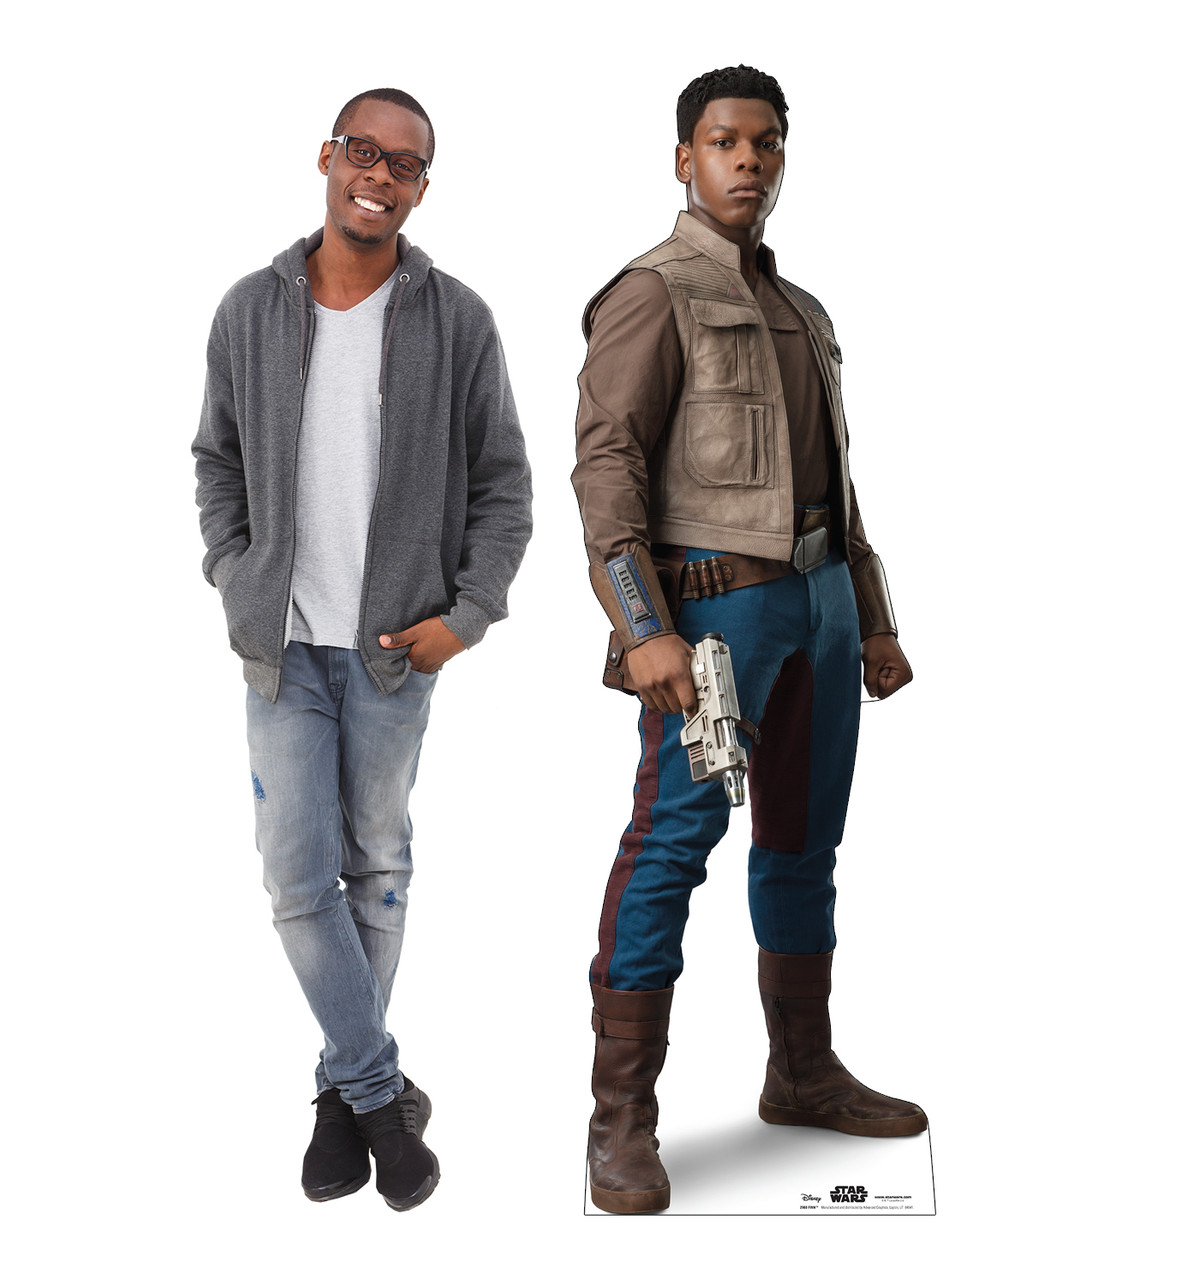 Life-size cardboard standee of Finn™ (Star Wars IX) with model.